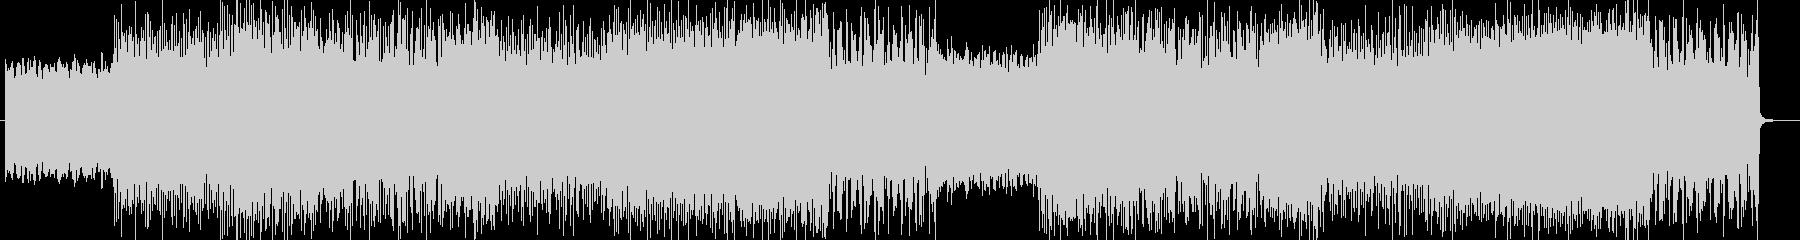 「HR/HM」「DARK」BGM86の未再生の波形